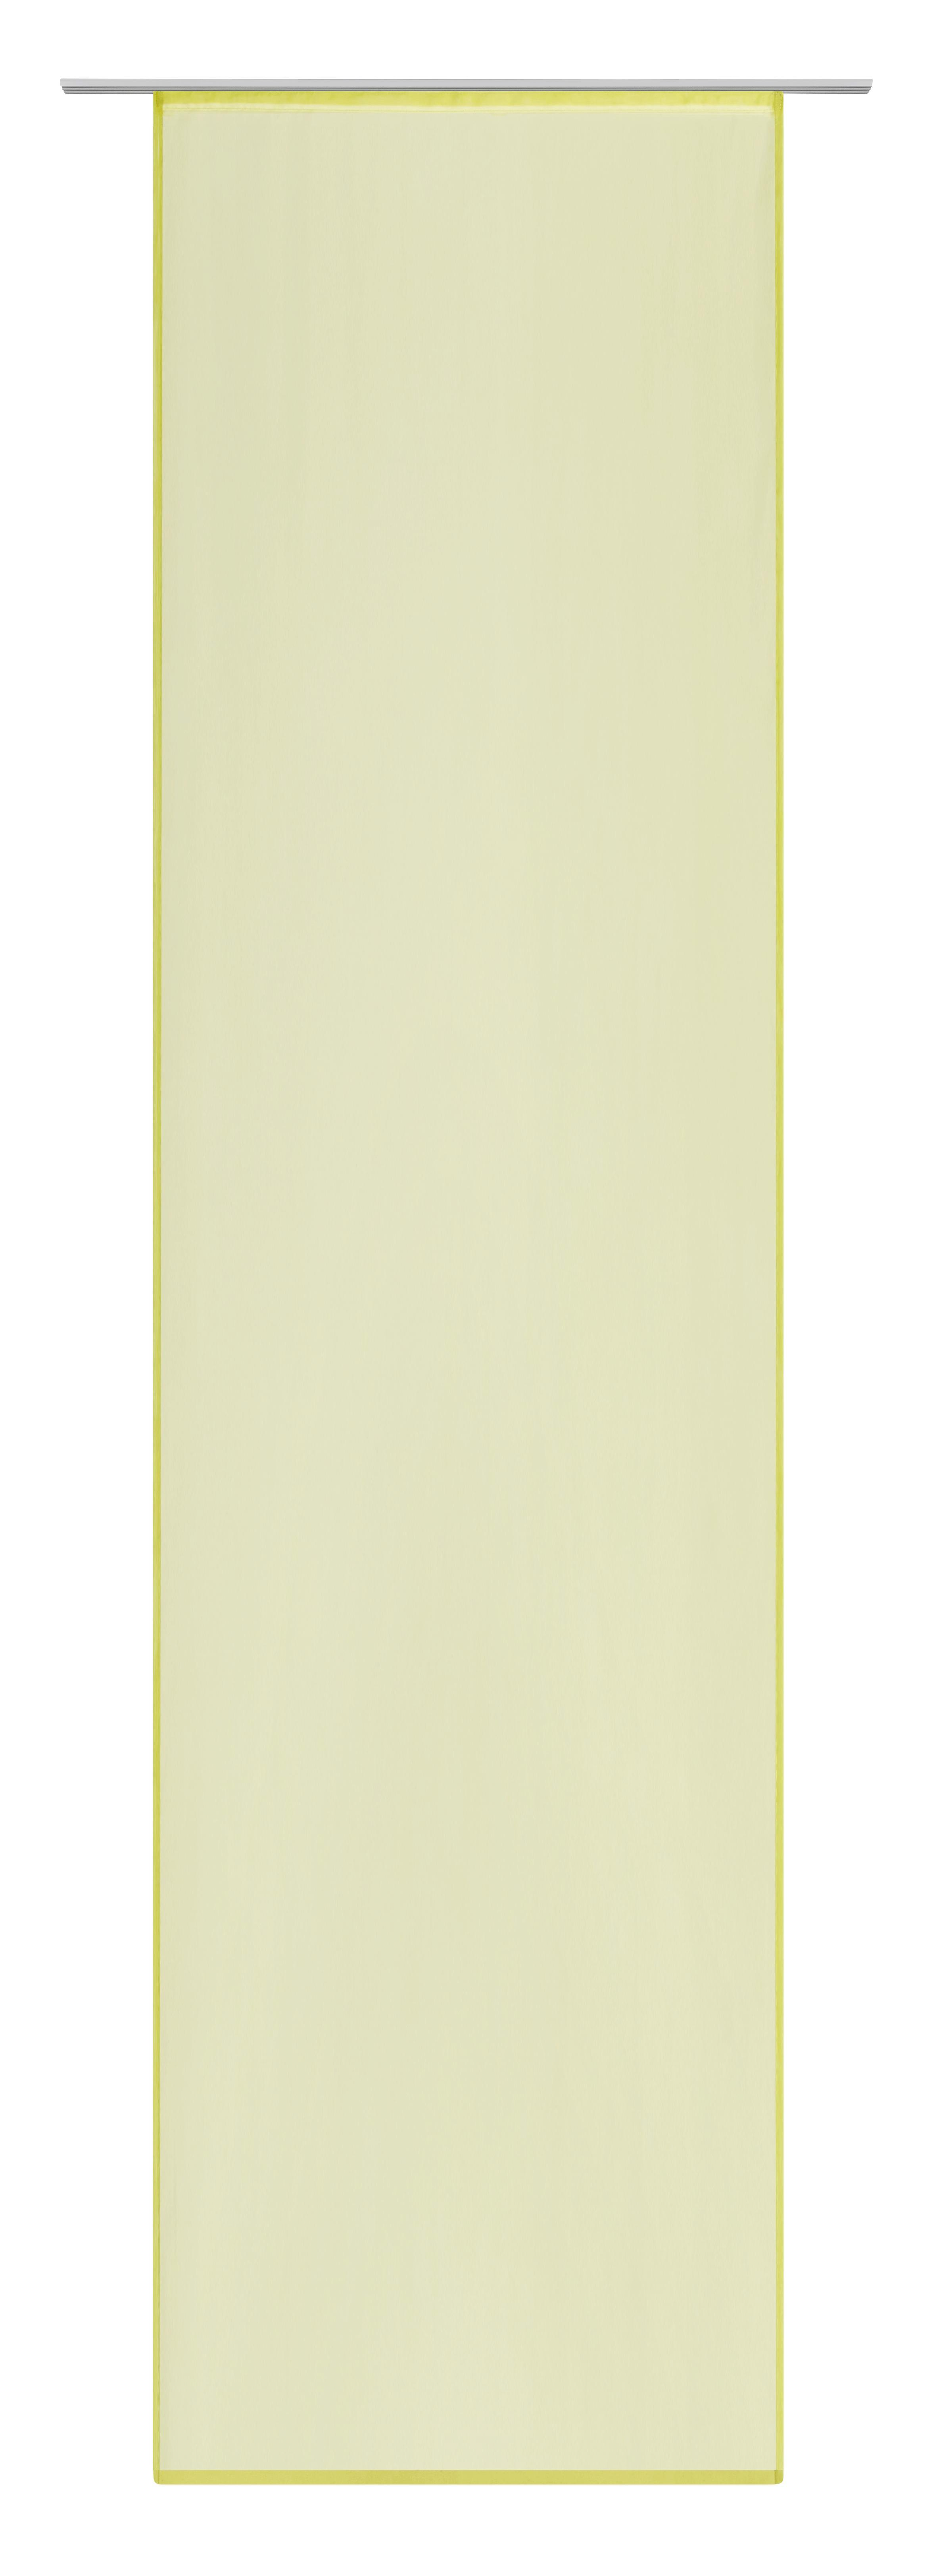 Flächenvorhang Flipp in Grün, ca. 60x245cm - Grün, Textil (60/245cm) - MÖMAX modern living